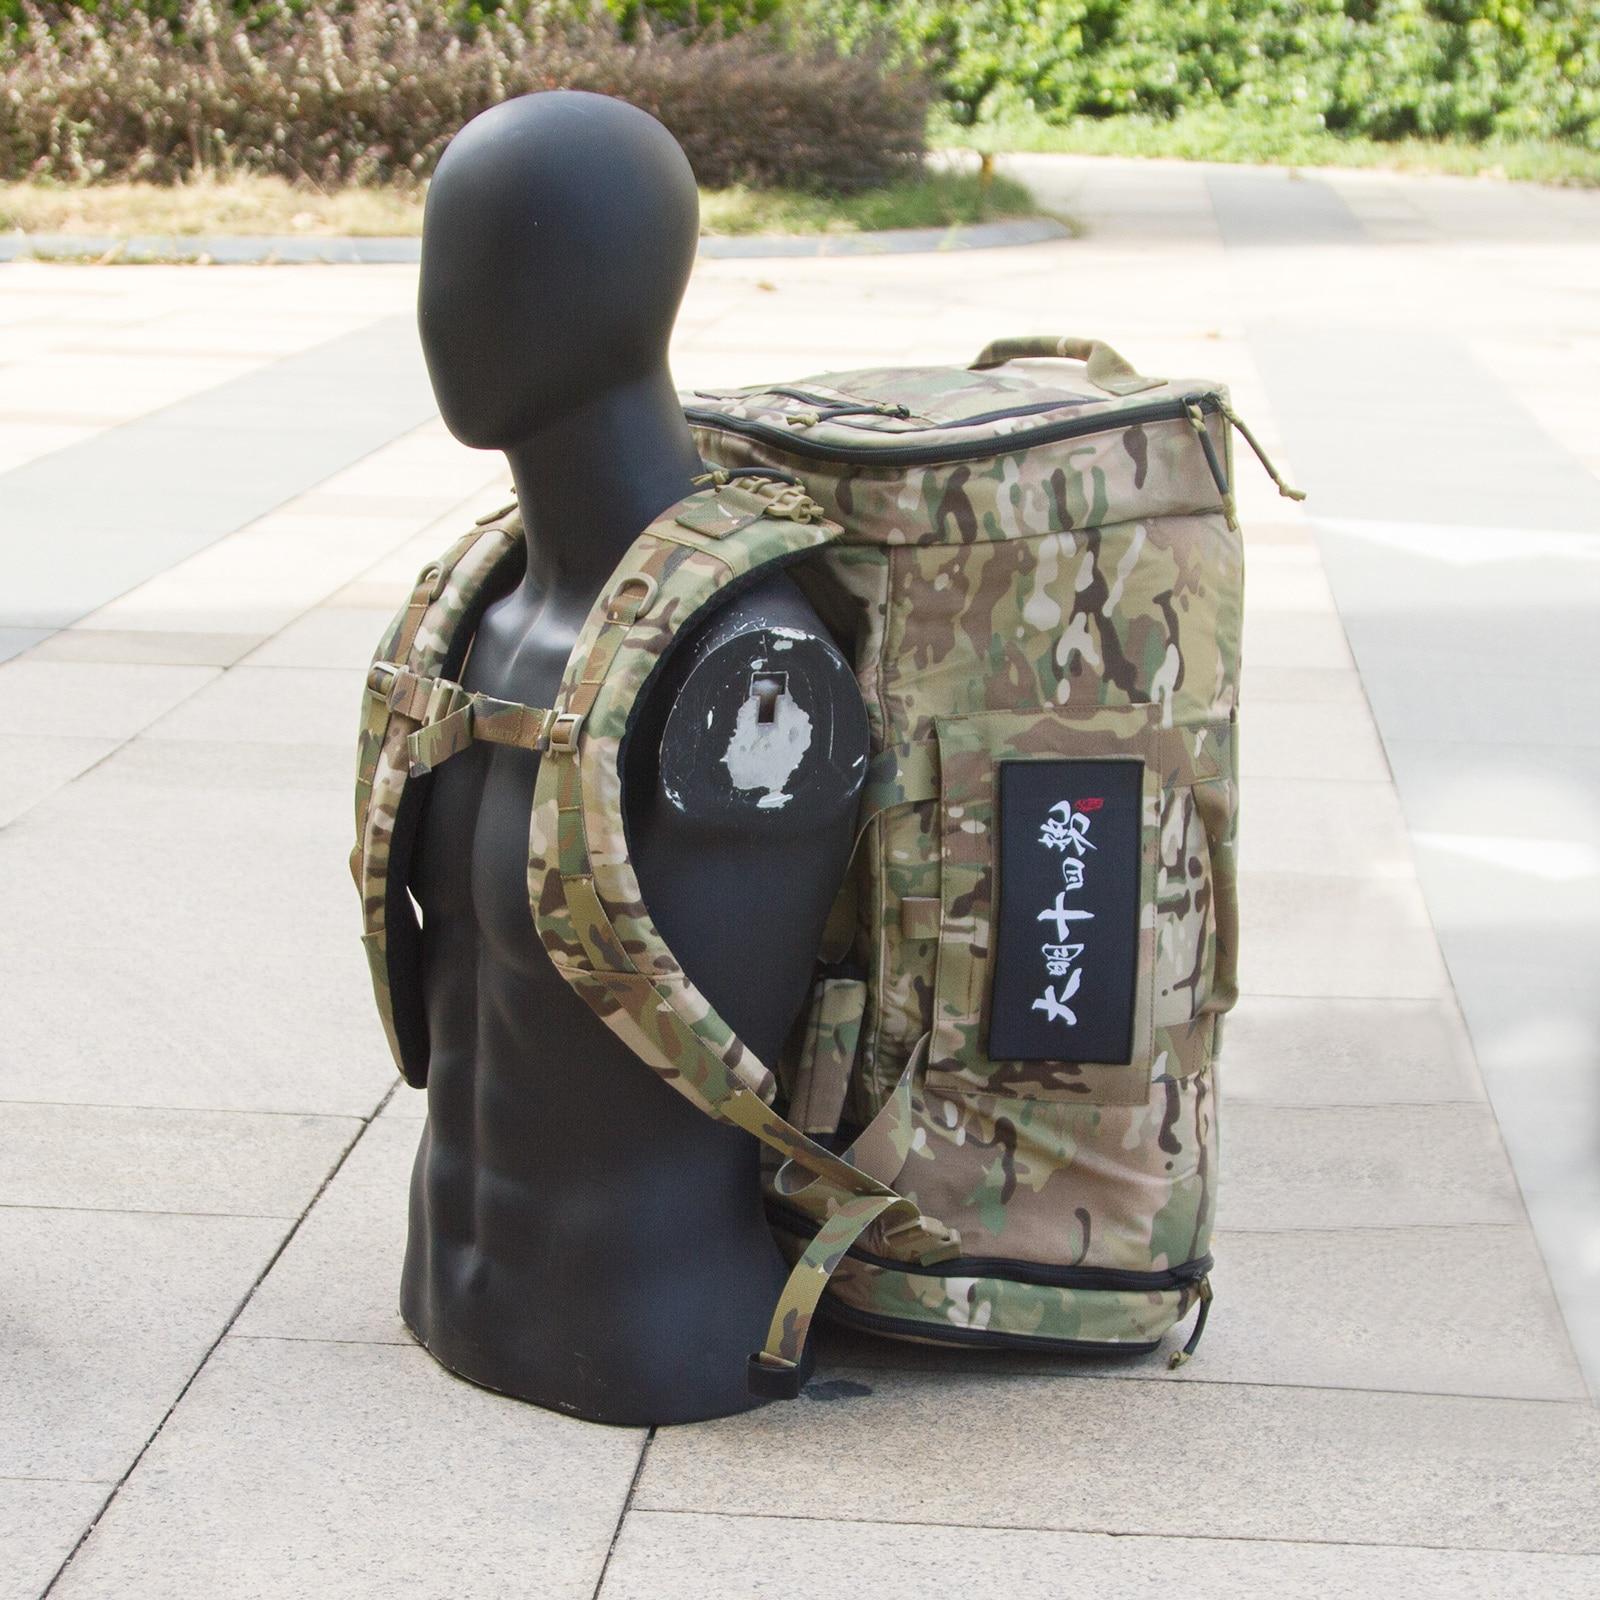 MING-14 Large Capacity Multifunction Equipment Backpack Tactical Shoulder Duffle bag Handbag - MC MCBK ( Limited Edition )